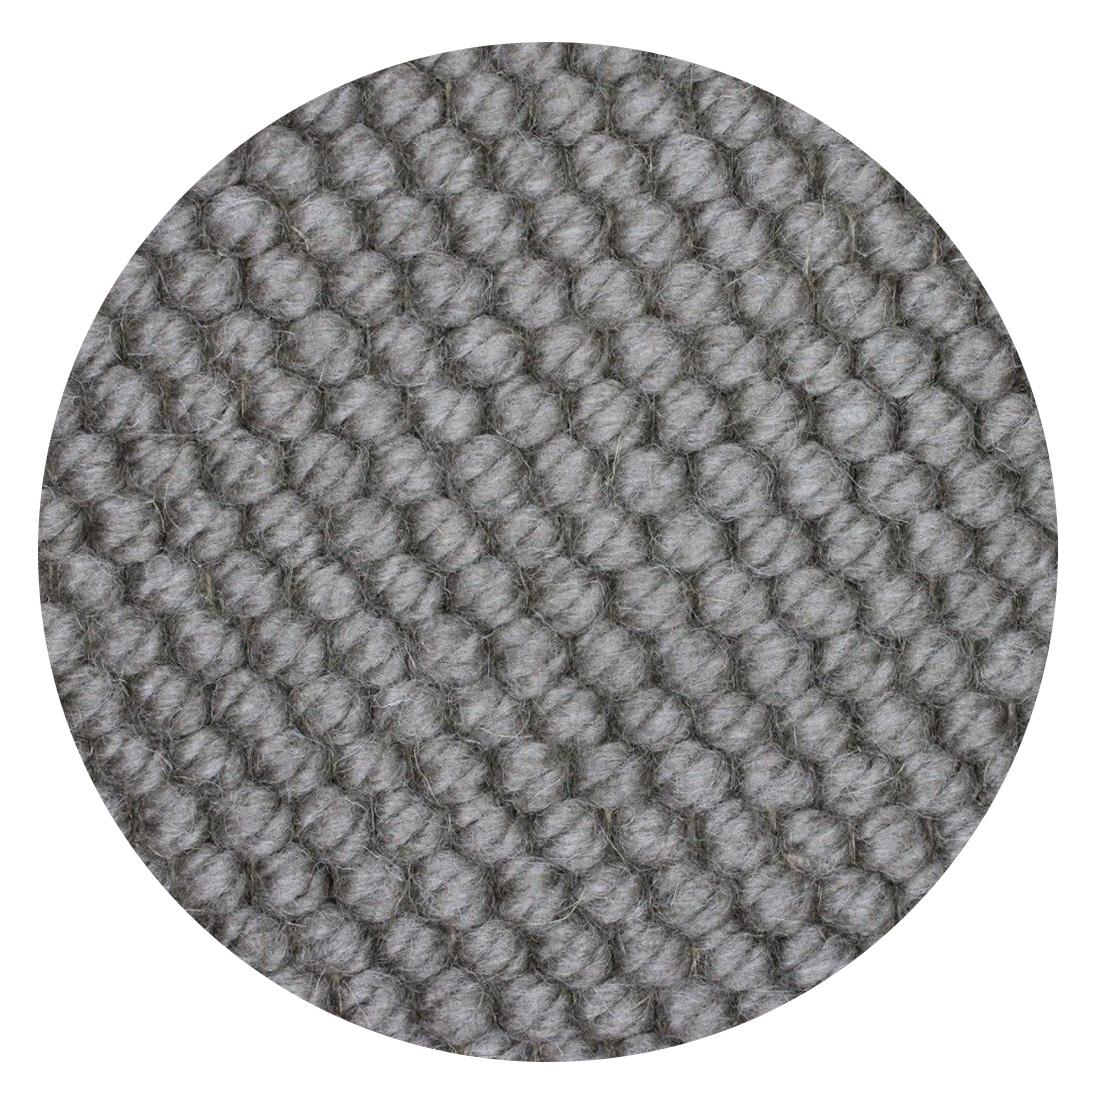 Rond Vloerkleed Nevada Taupe 100 % New Zealand Wool